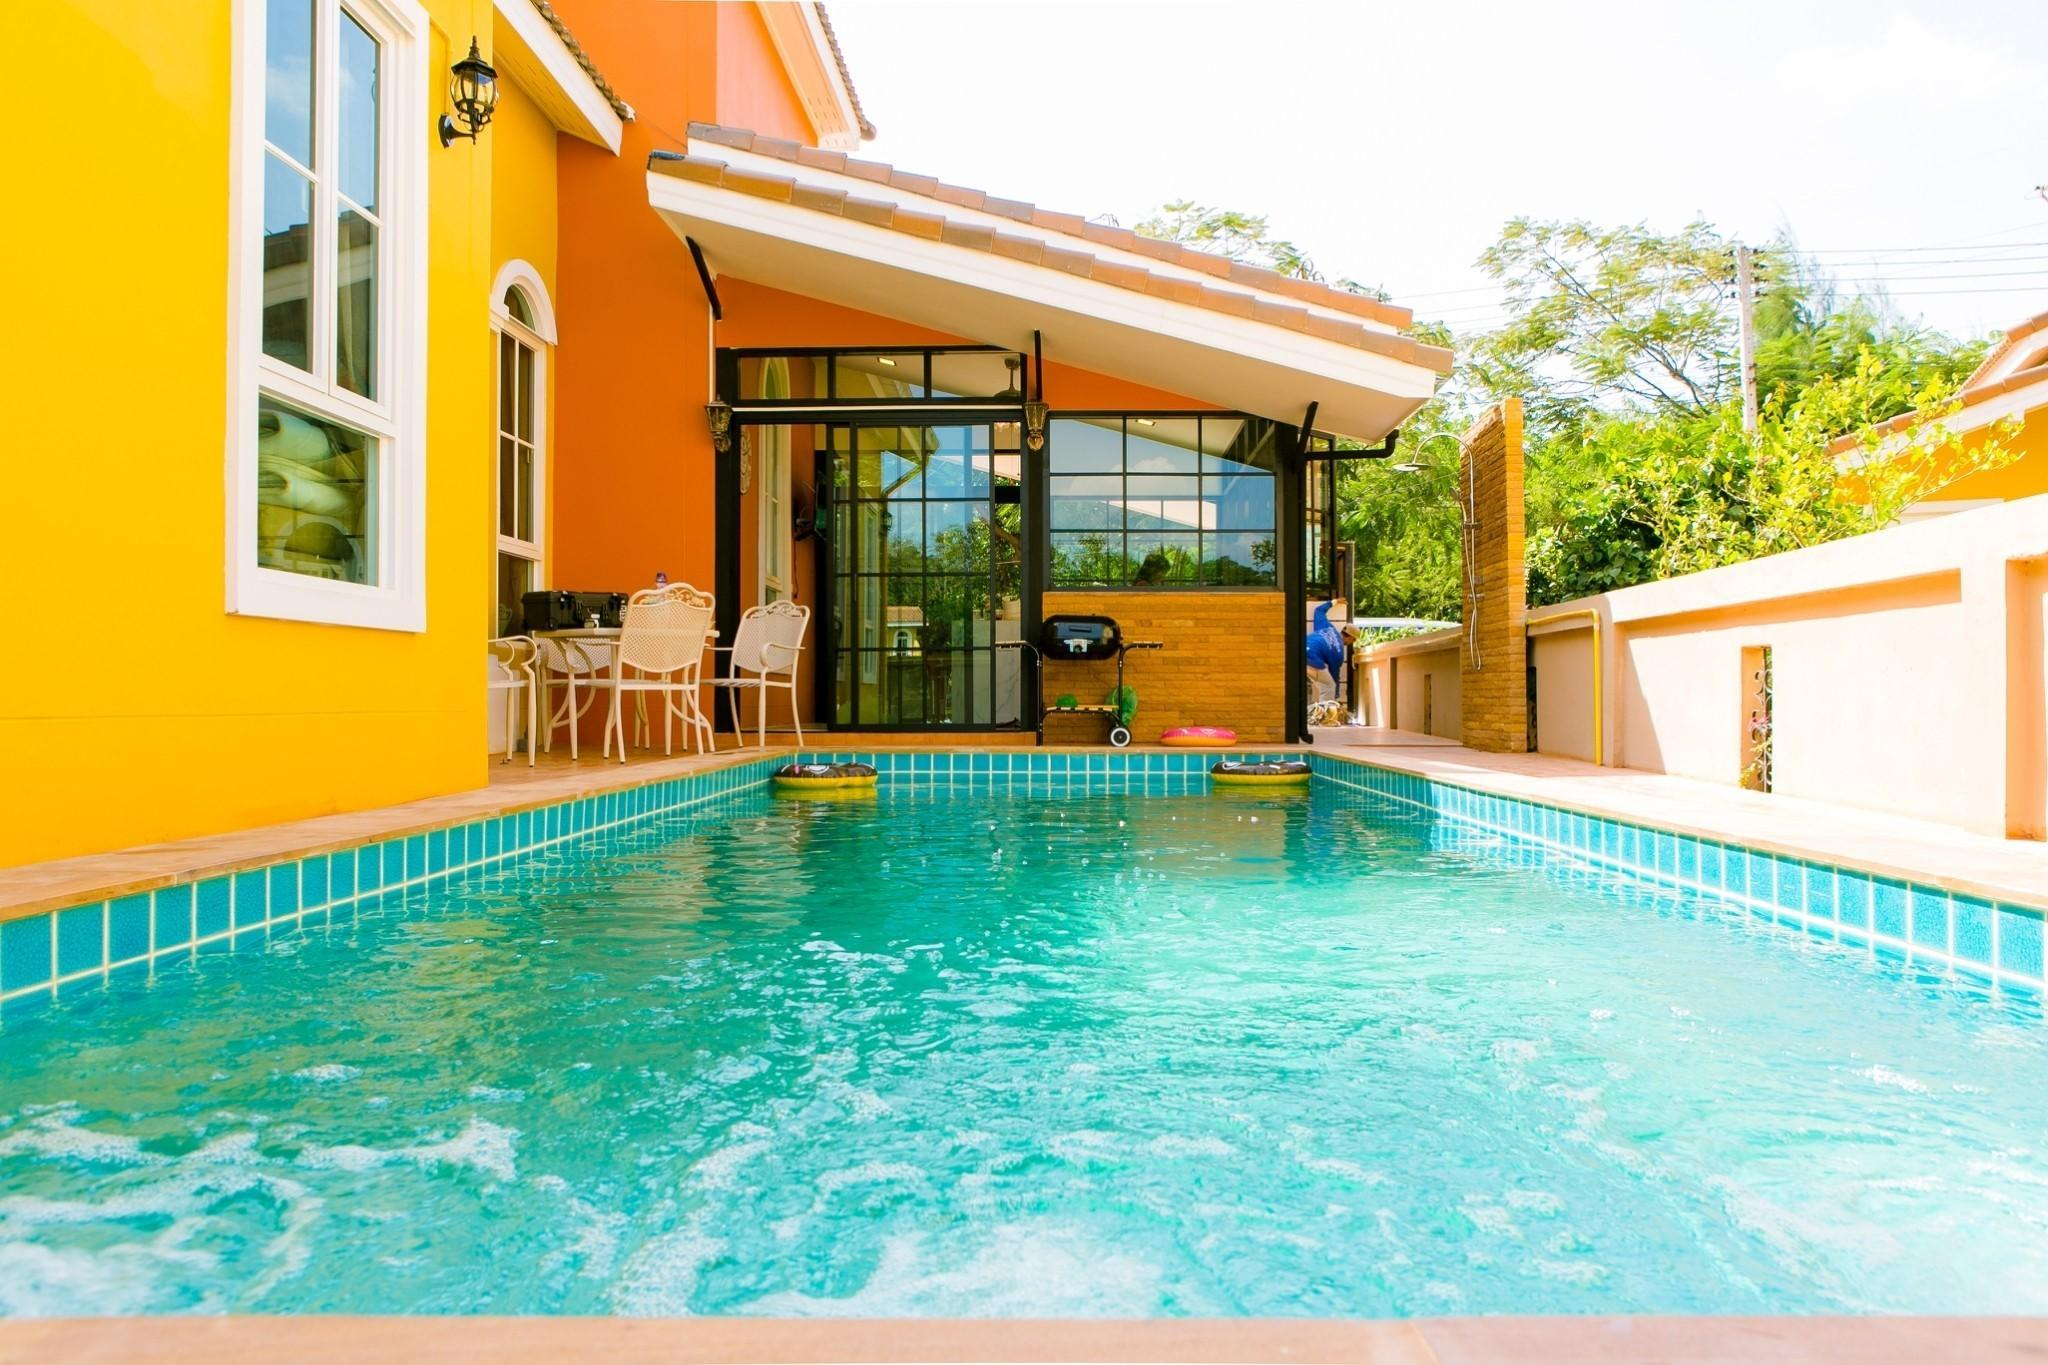 Florence Pool Villa Khaoyai